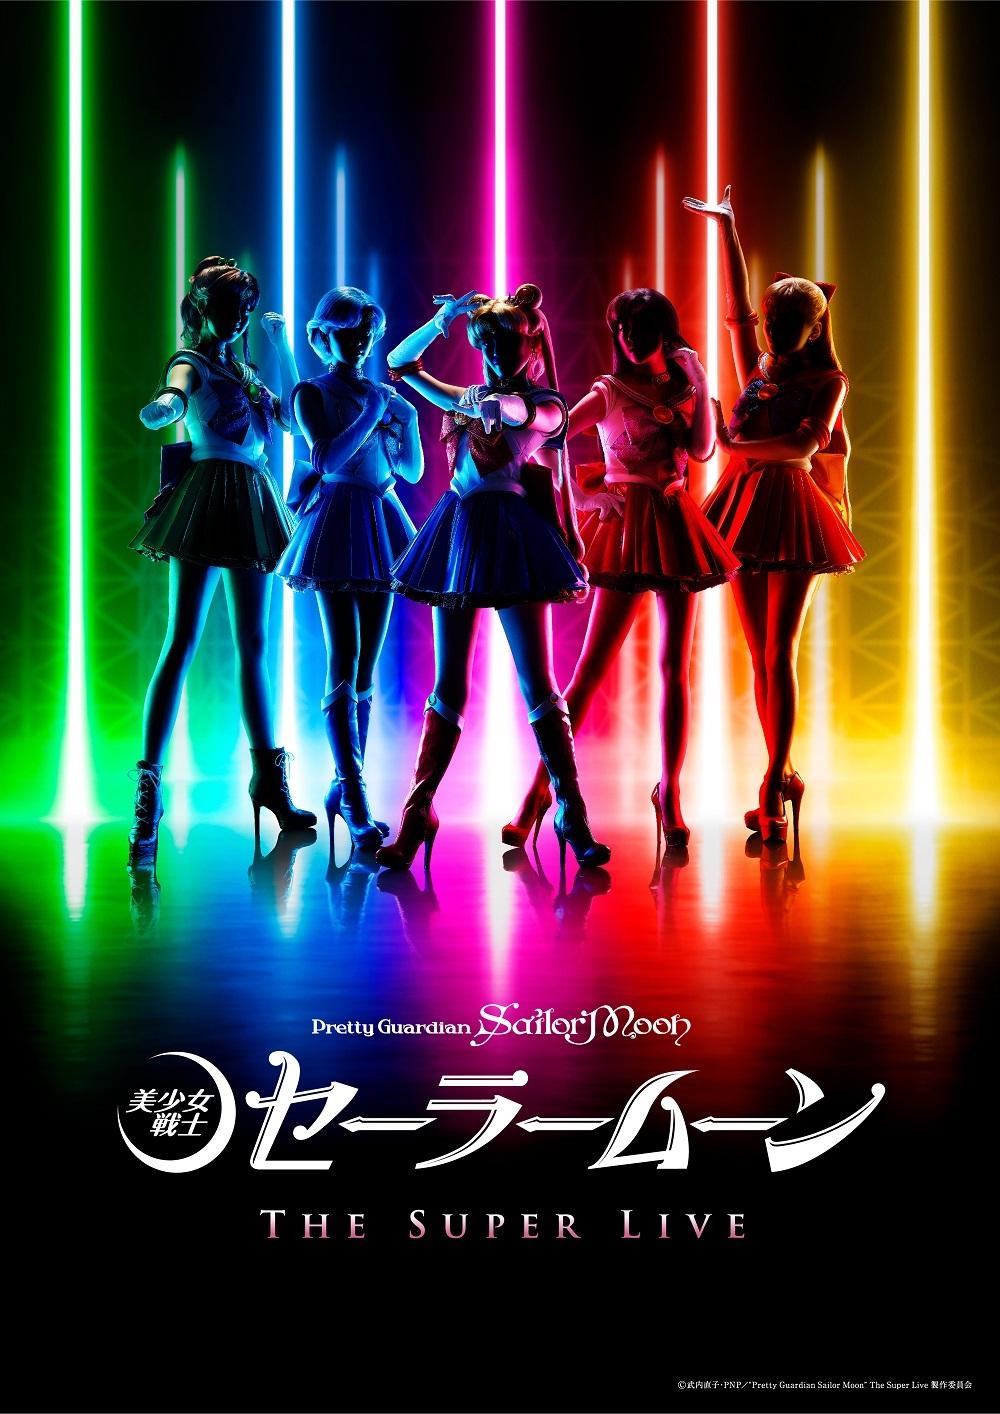 "(C)武内直子・PNP/""Pretty Guardian Sailor Moon"" The Super Live 製作委員会"